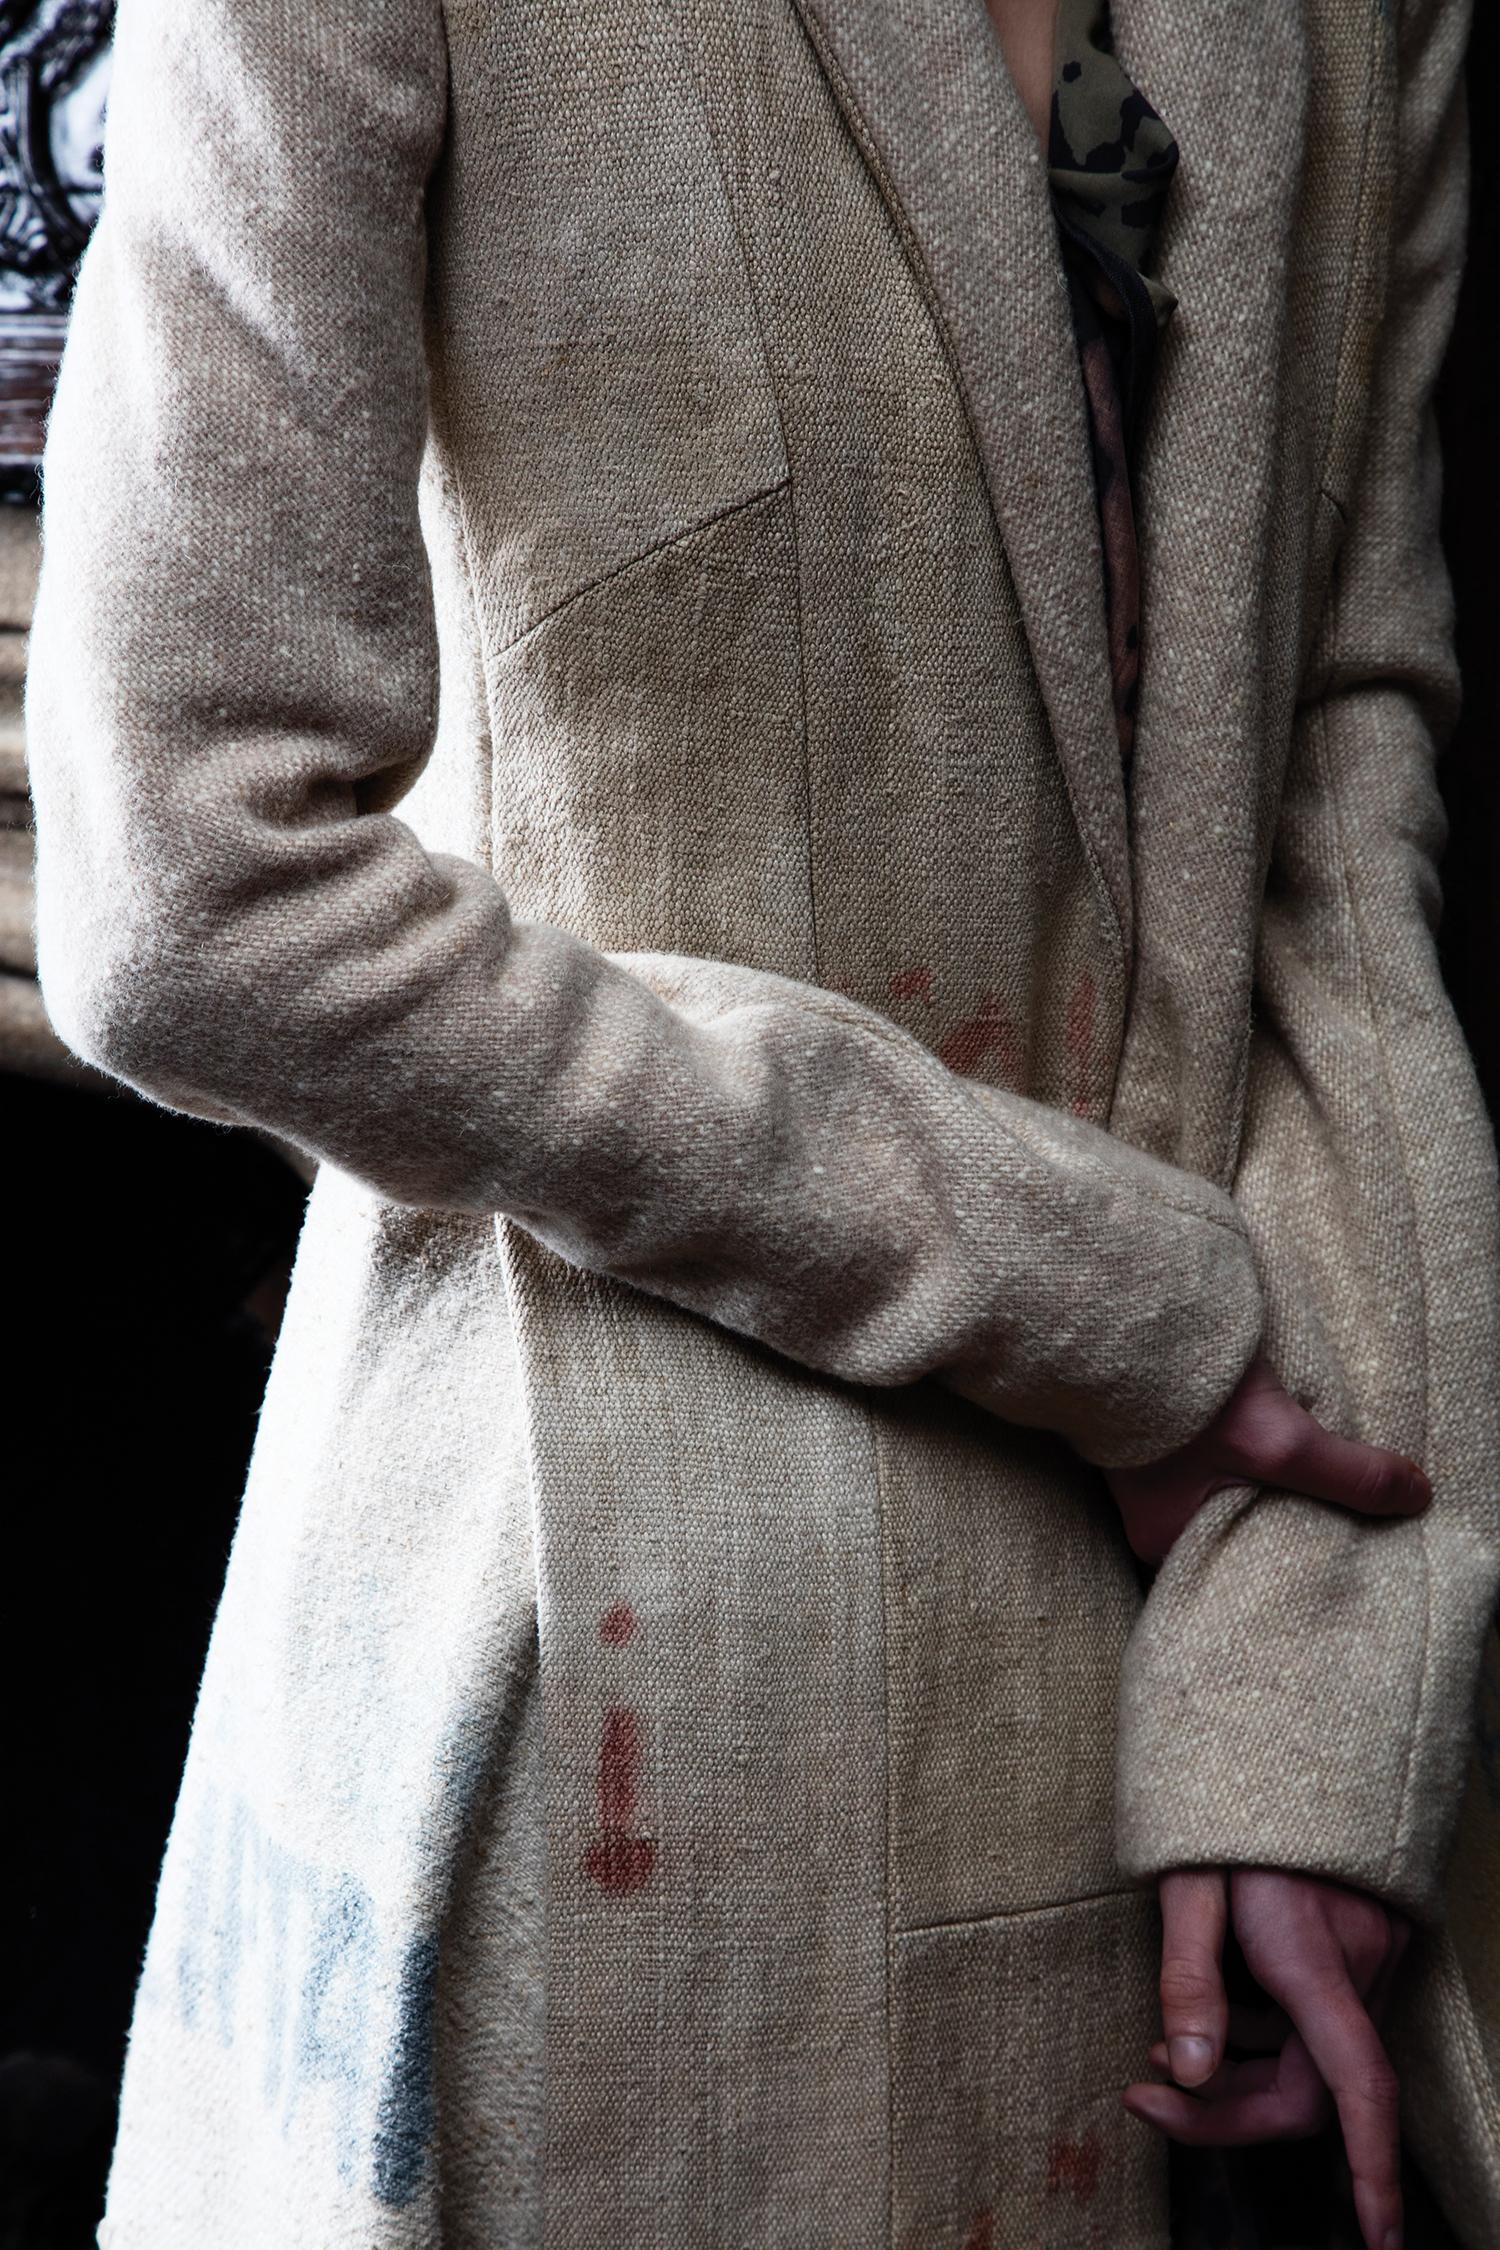 Coat by Lindsey Truman, MFA Fashion Design. Top by Justin Moreno, BFA Menswear Design.